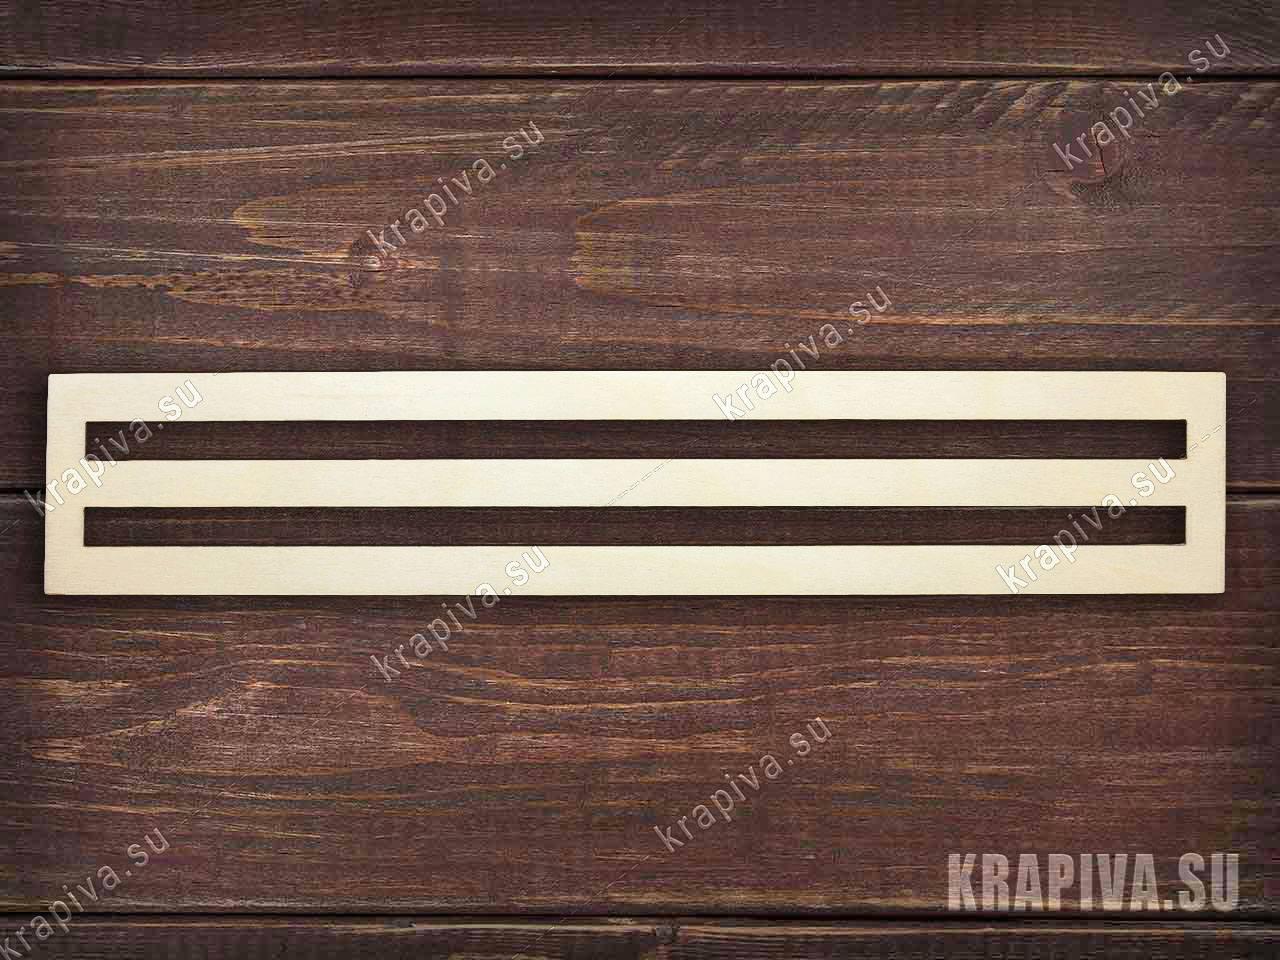 Развивающая линейка №3 за 46 руб. в магазине Крапива (krapiva.su) (фото)